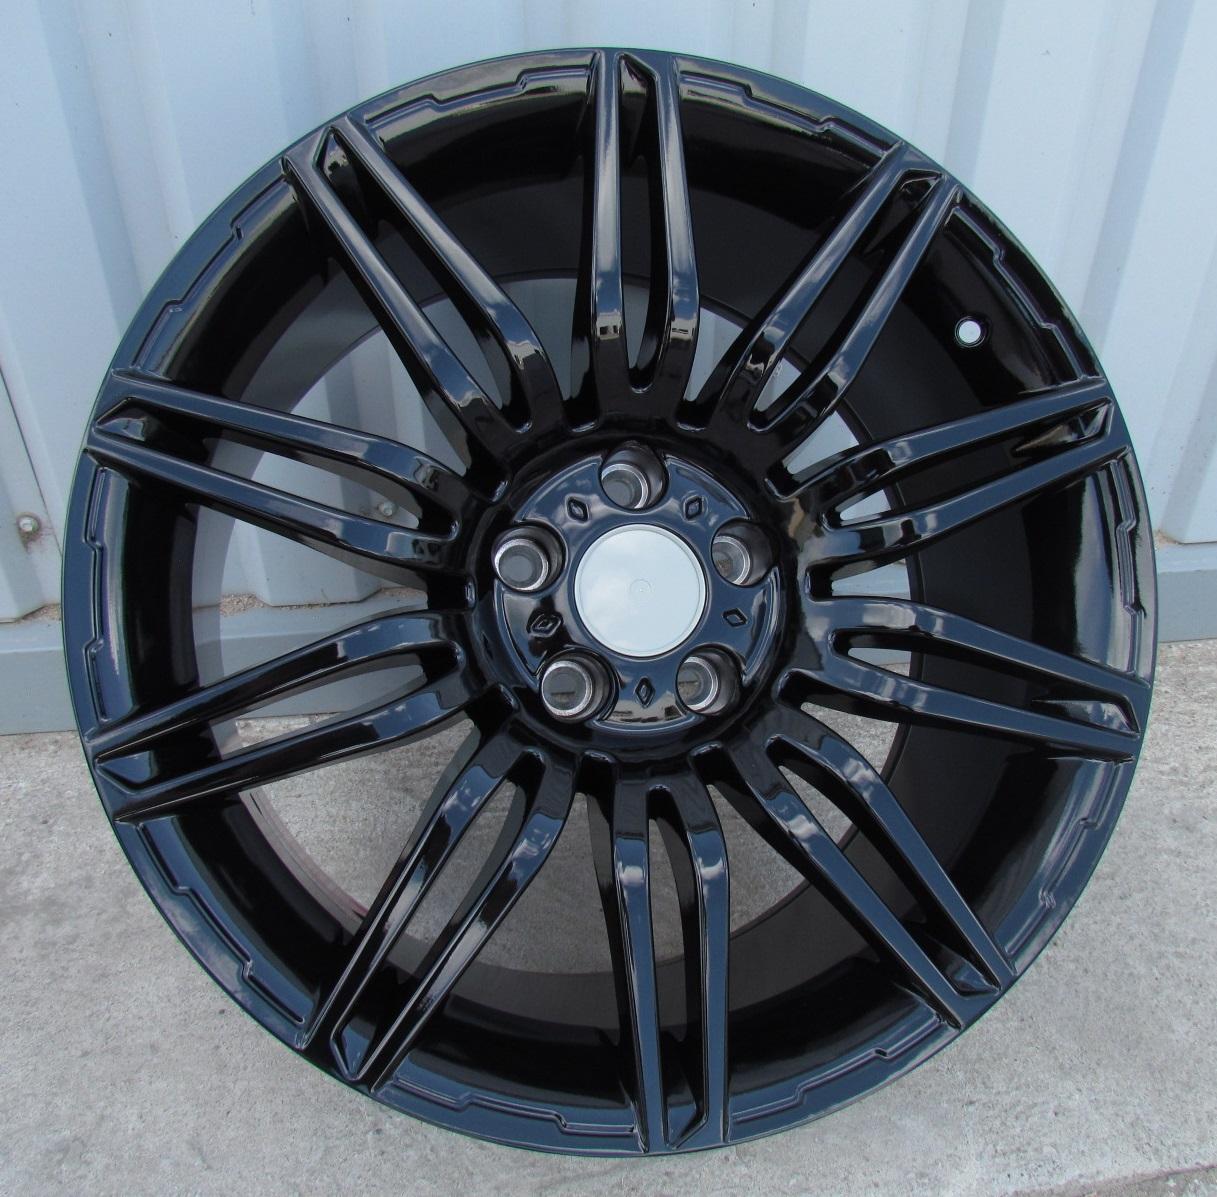 B19X8.5 5X120 ET16 72.6 XF528 (BK159) BLACK (X) (Rear+Front) RWR BM (K2) 8.5x19 ET16 5x120